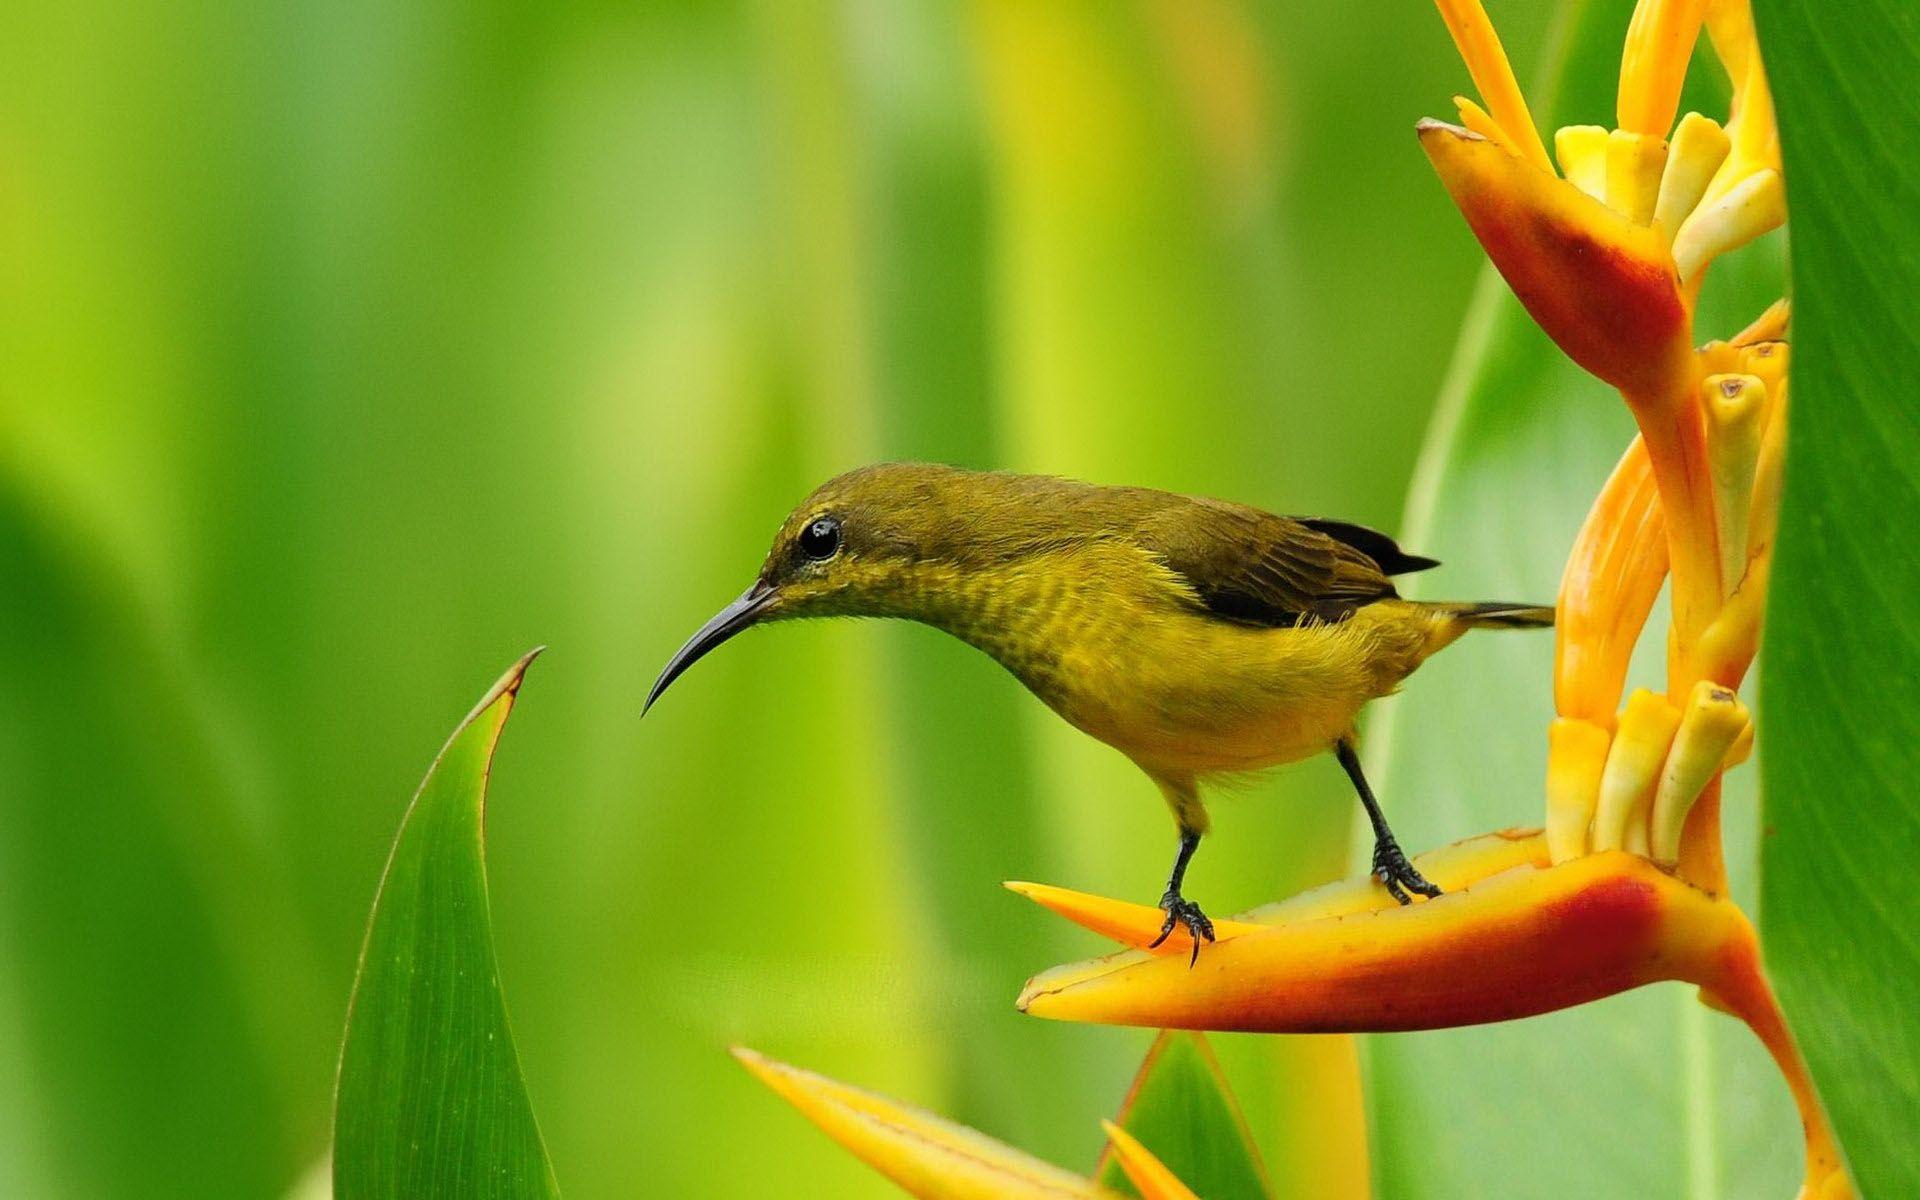 Small Bird On Bird Of Paradise Flower Wallpaper 1920x1200